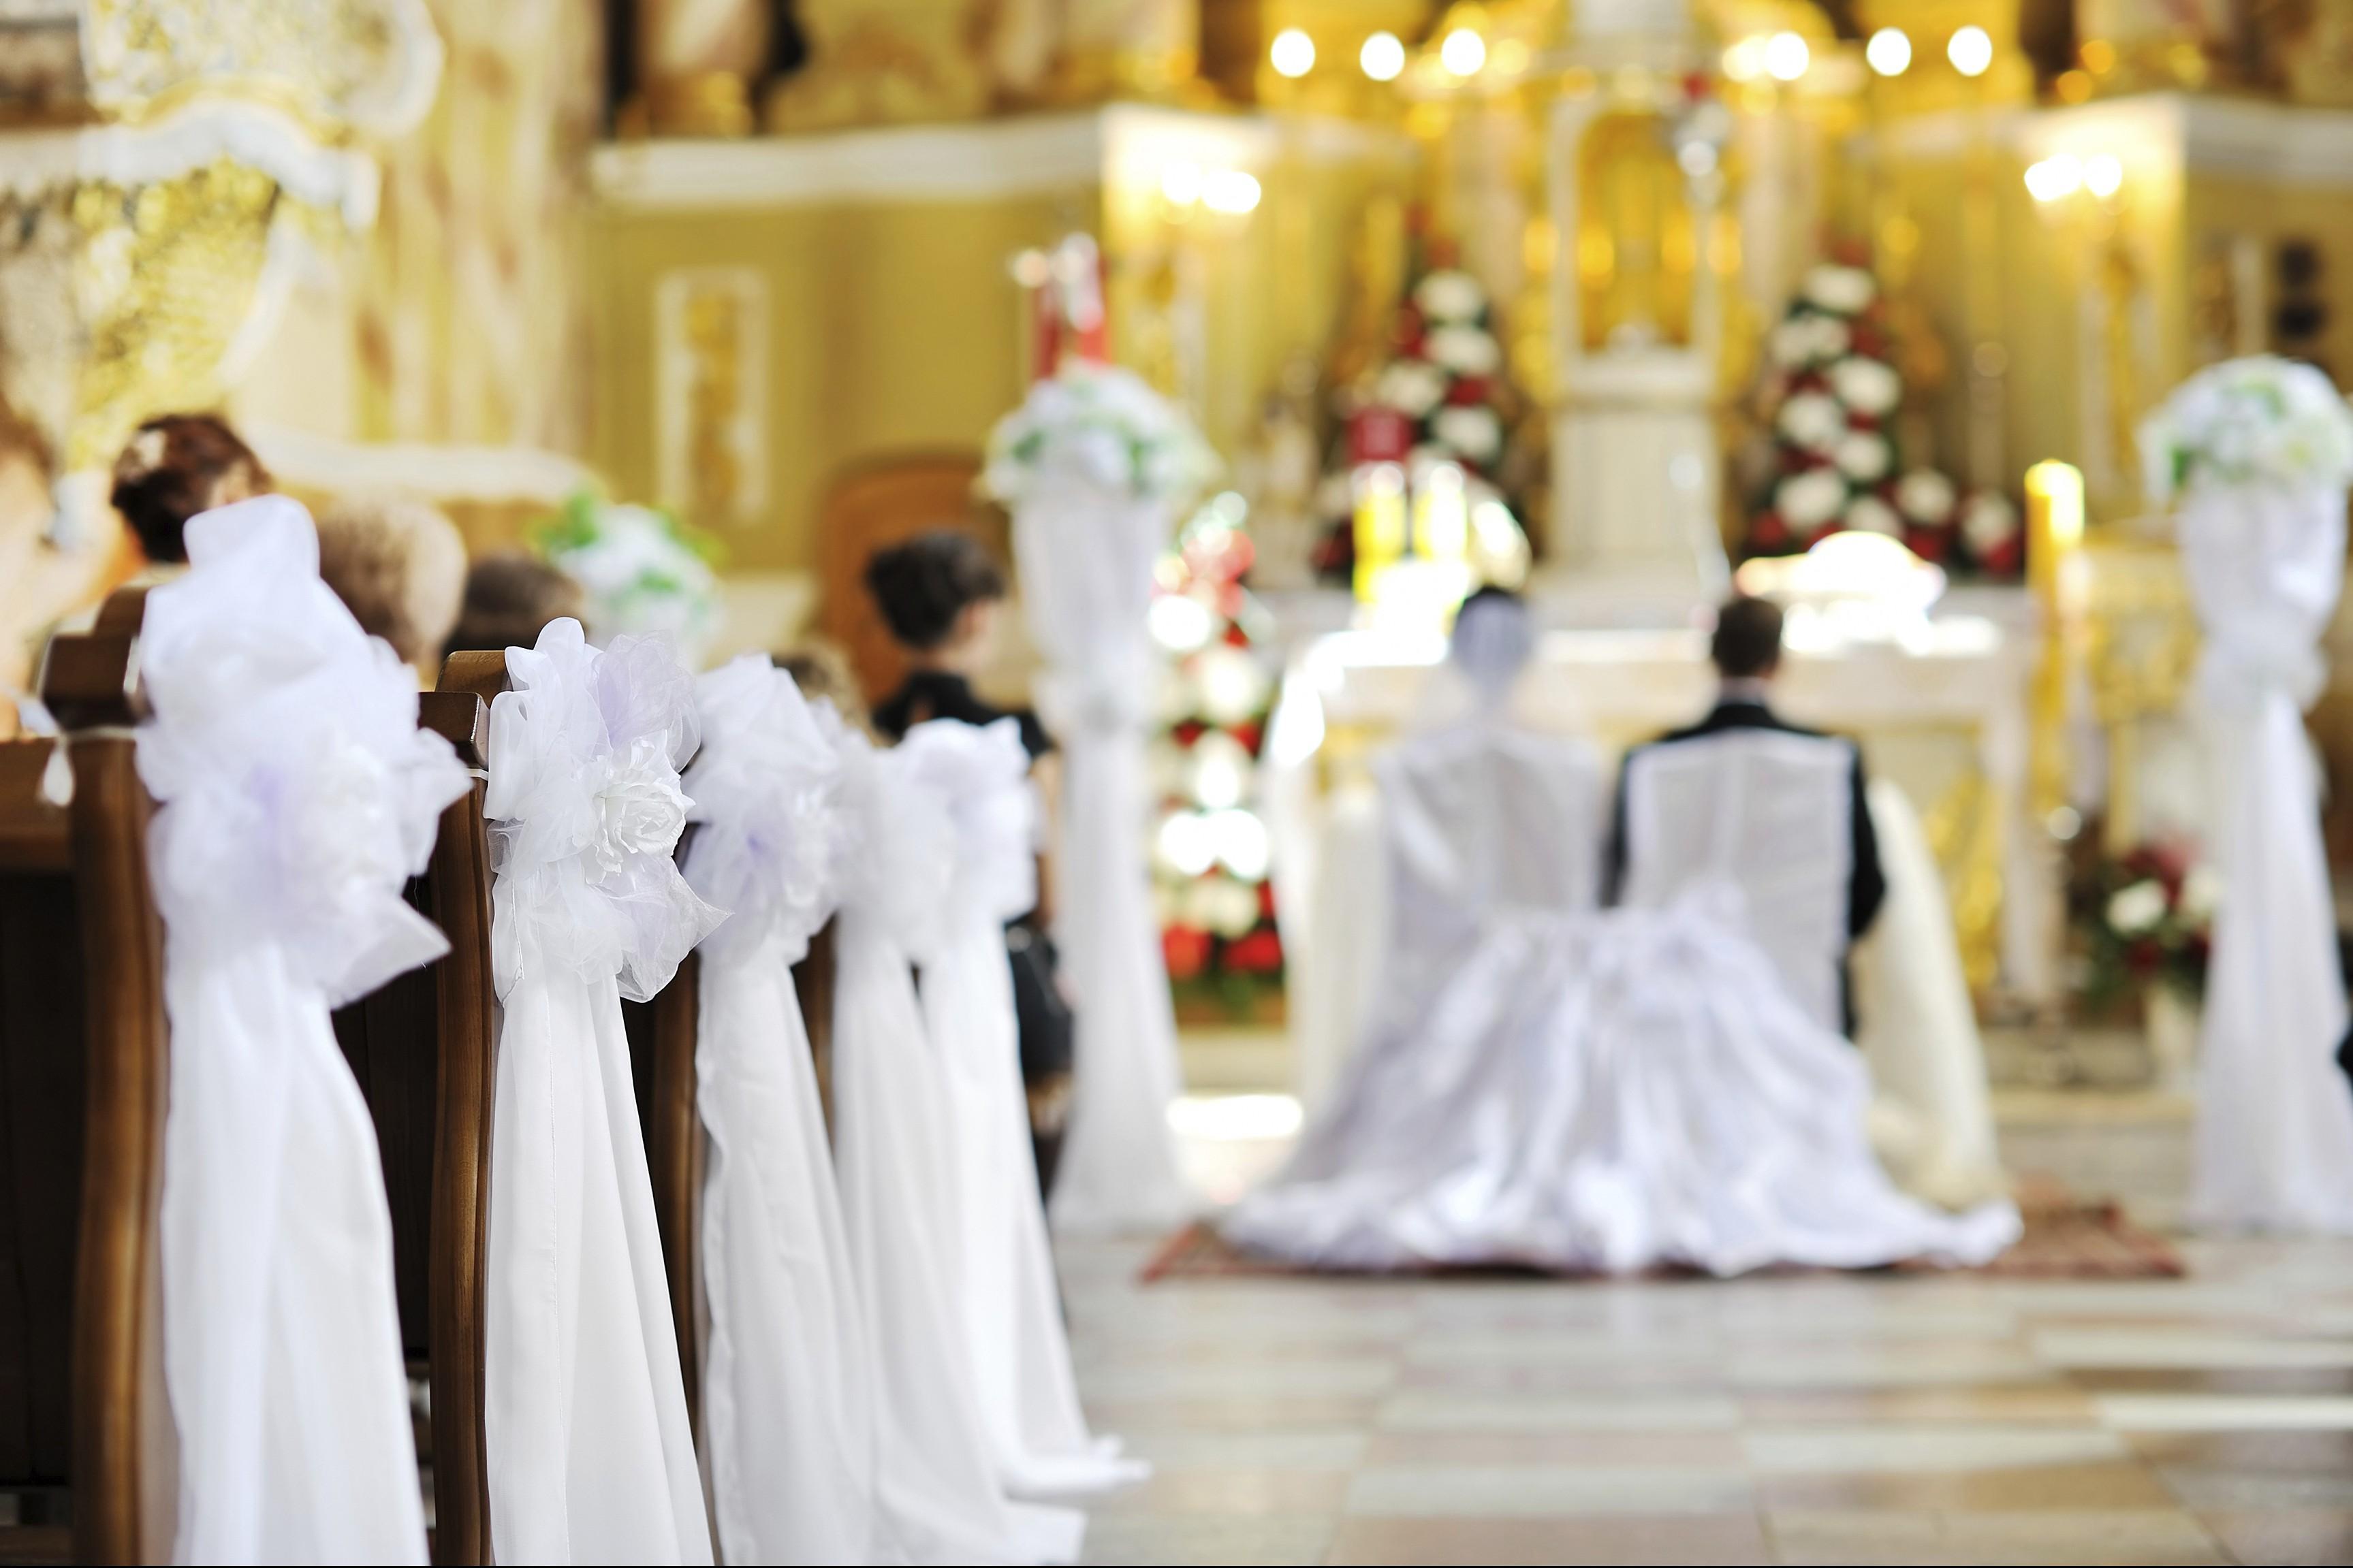 Auguri Matrimonio In Ritardo : Macerata sposa in ritardo il parroco comincia matrimonio